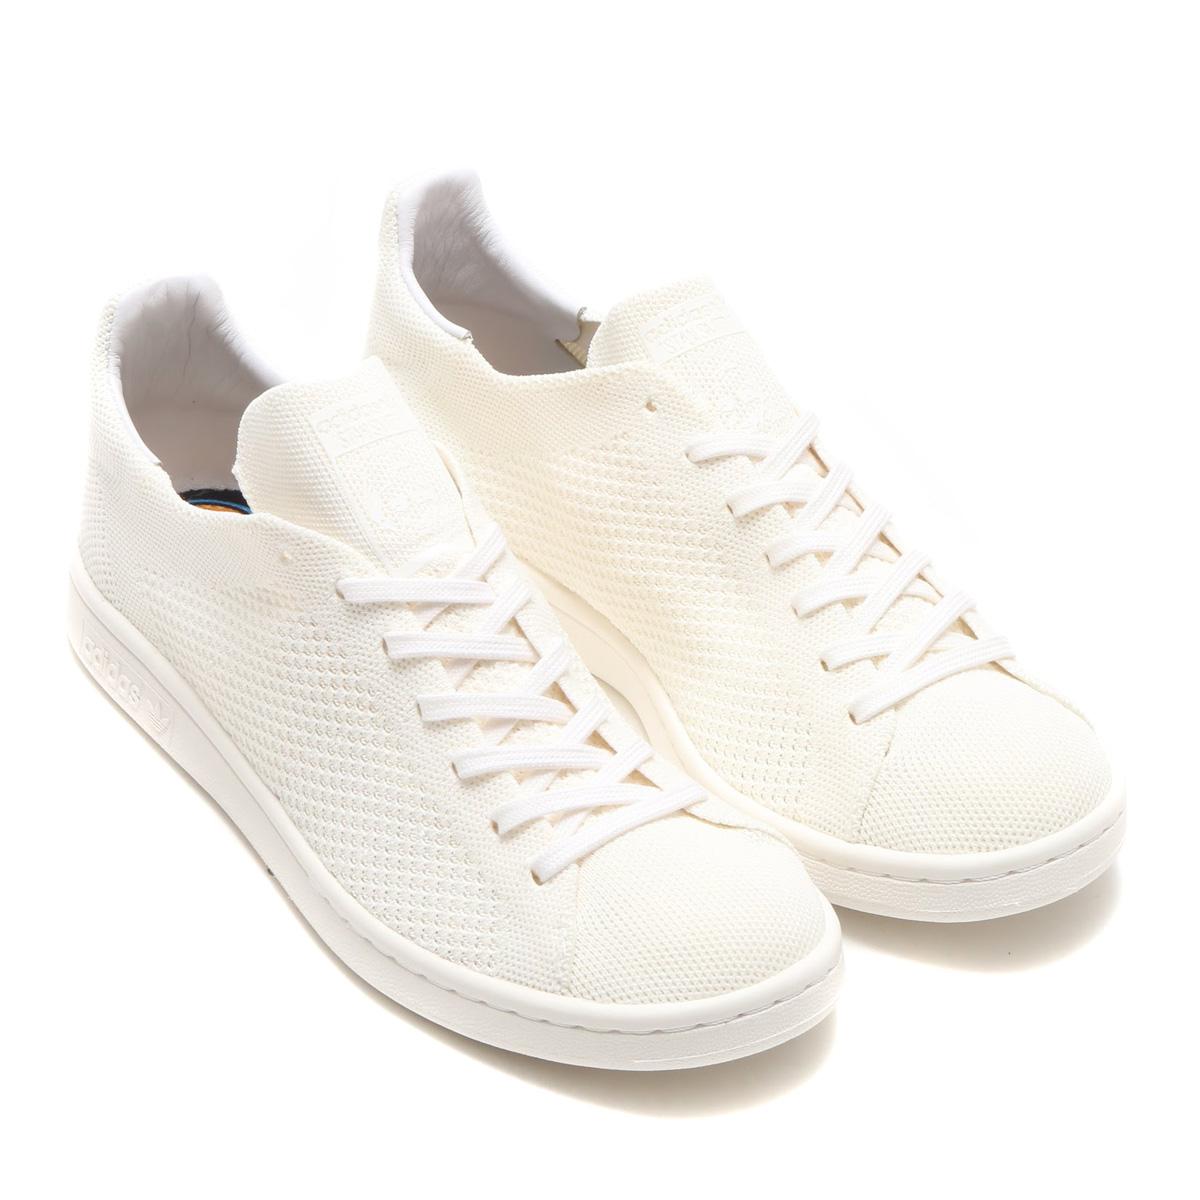 adidas Originals PW HU HOLI STAN SMITH BC (アディダス オリジナルス ファレル ウィリアムス HU HOLI スタンスミス BC) Cream White/Ftwr White/Ftwr White【メンズ スニーカー】